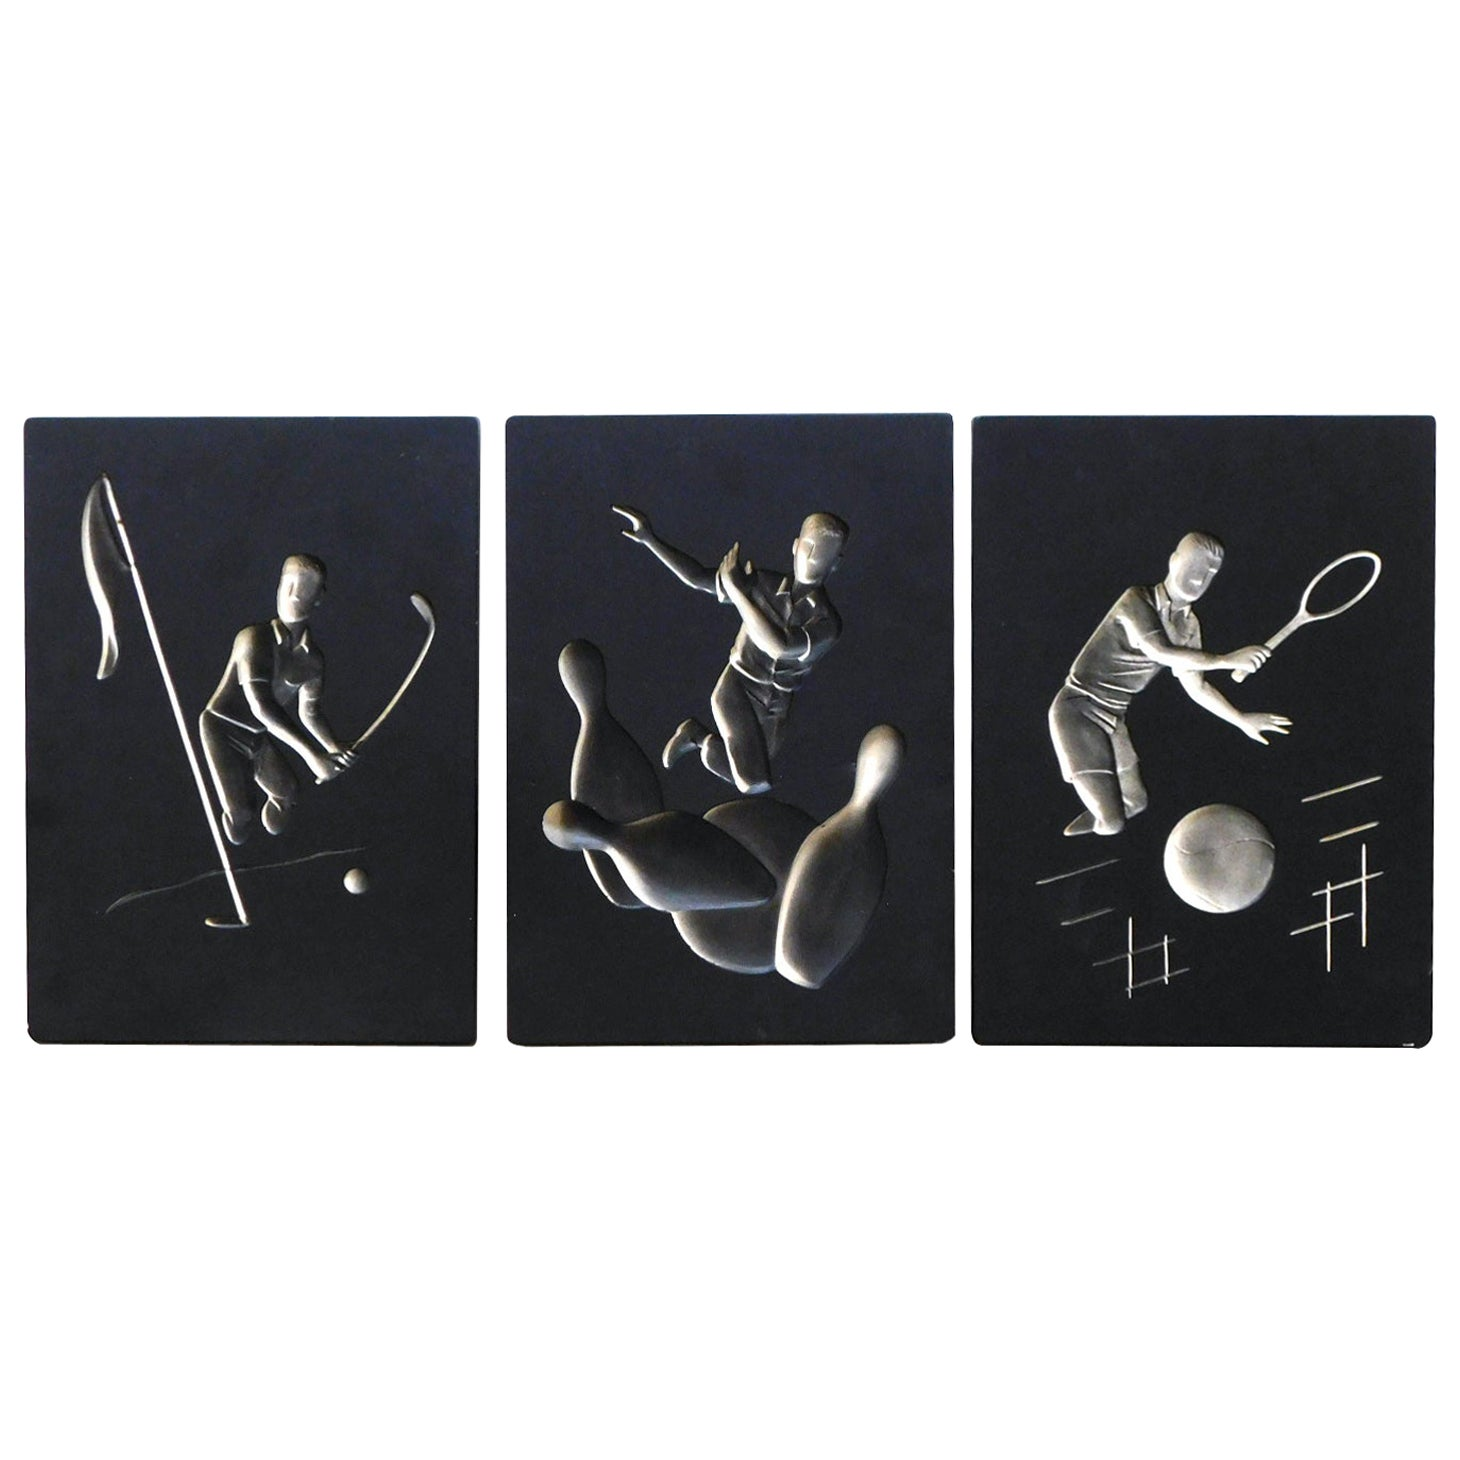 Fun Set of 3 Hans Richter 1961 Artcraft Plaster Negative Relief Sports Plaques